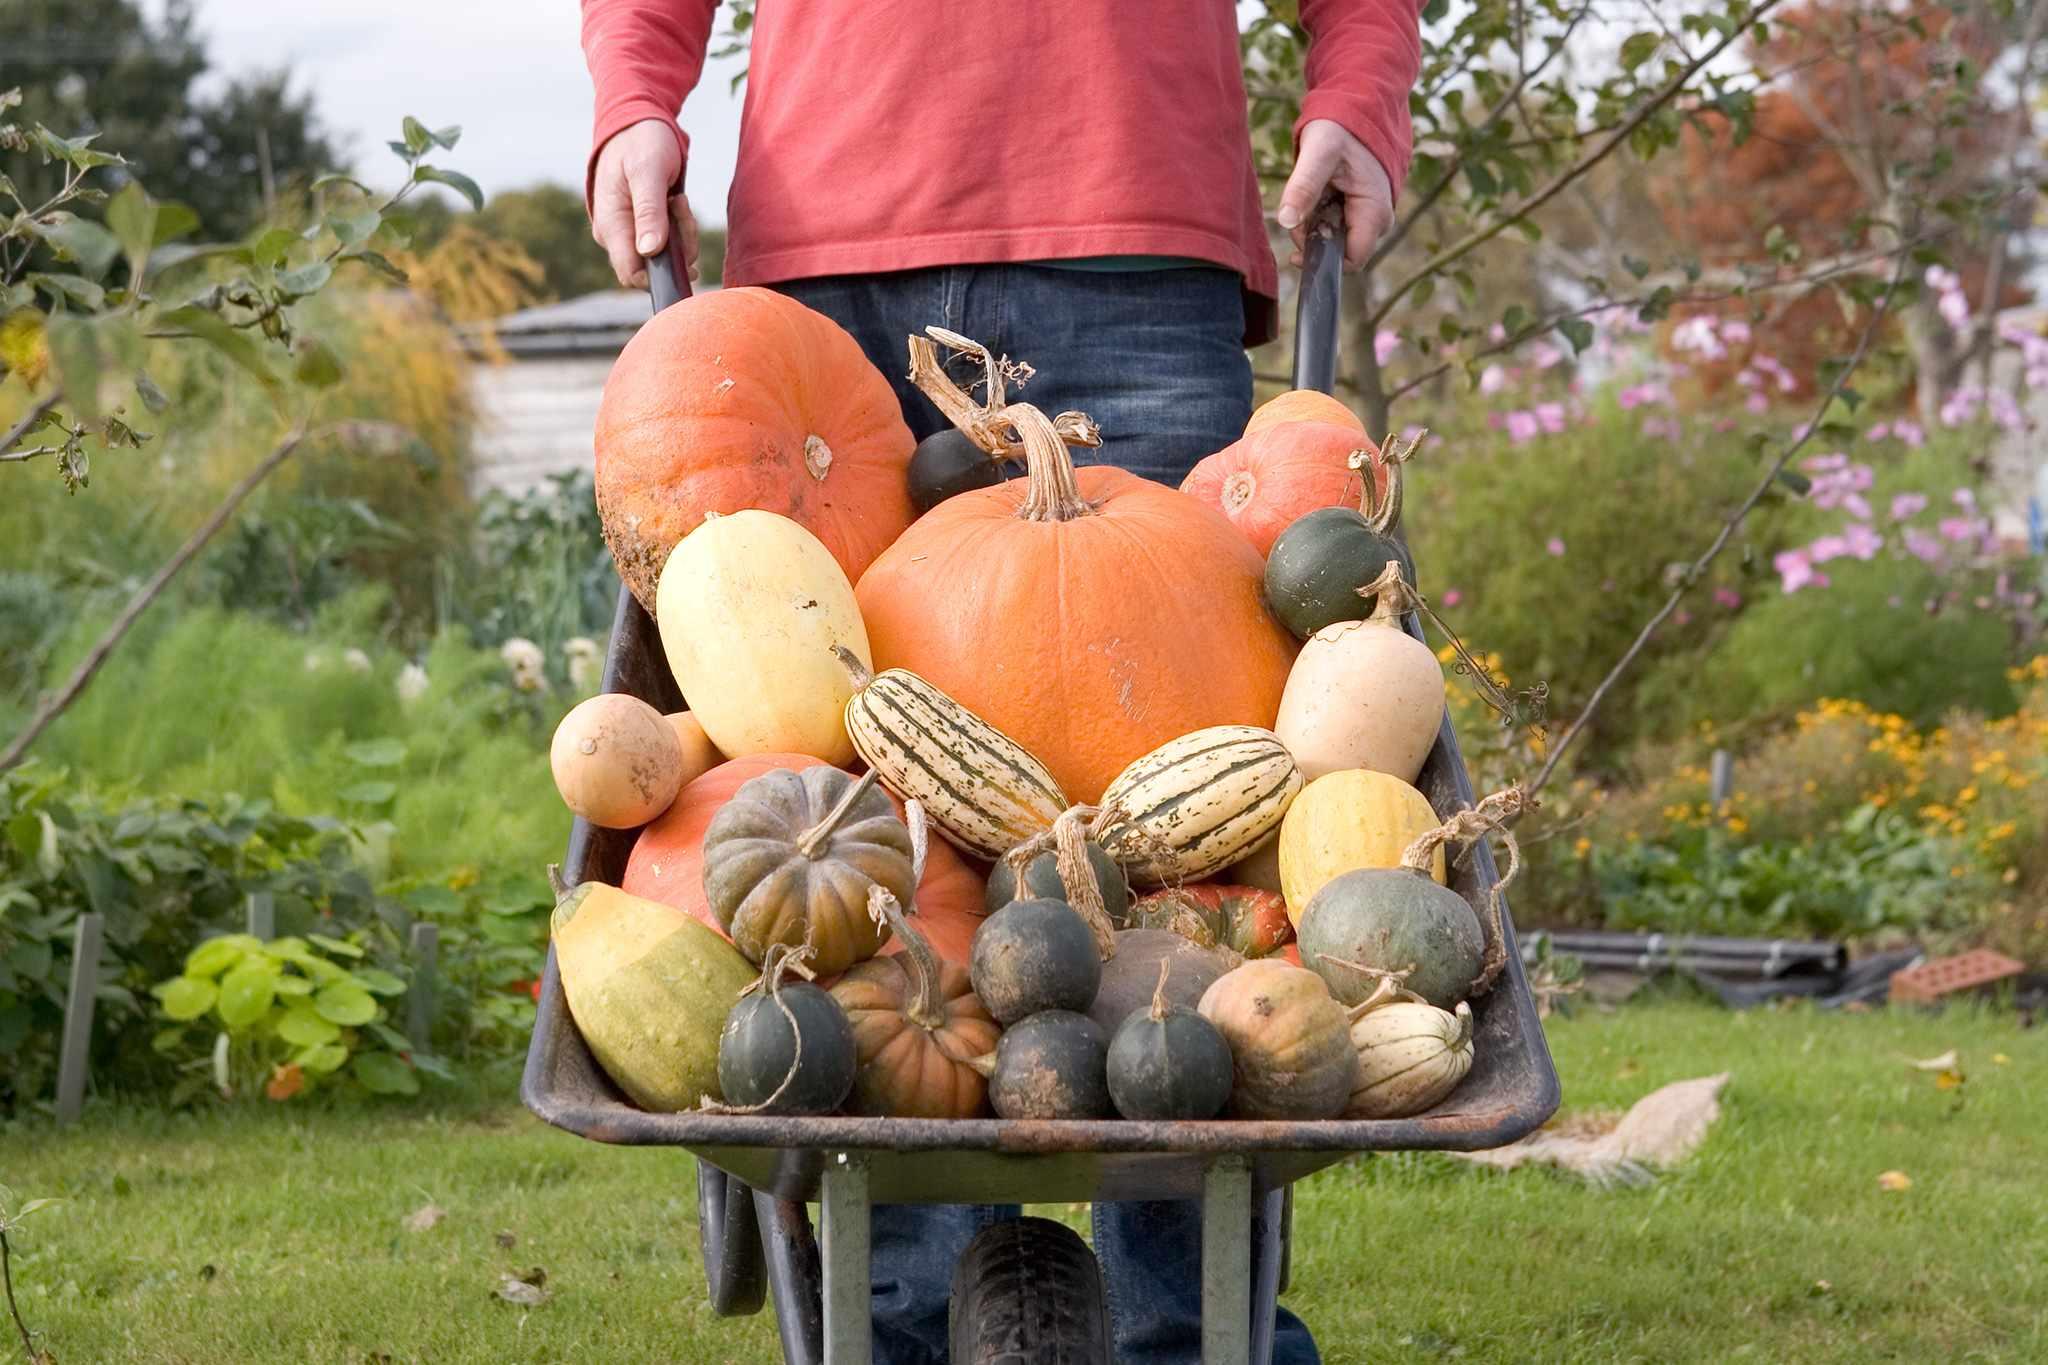 Harvesting pumpkins and squash